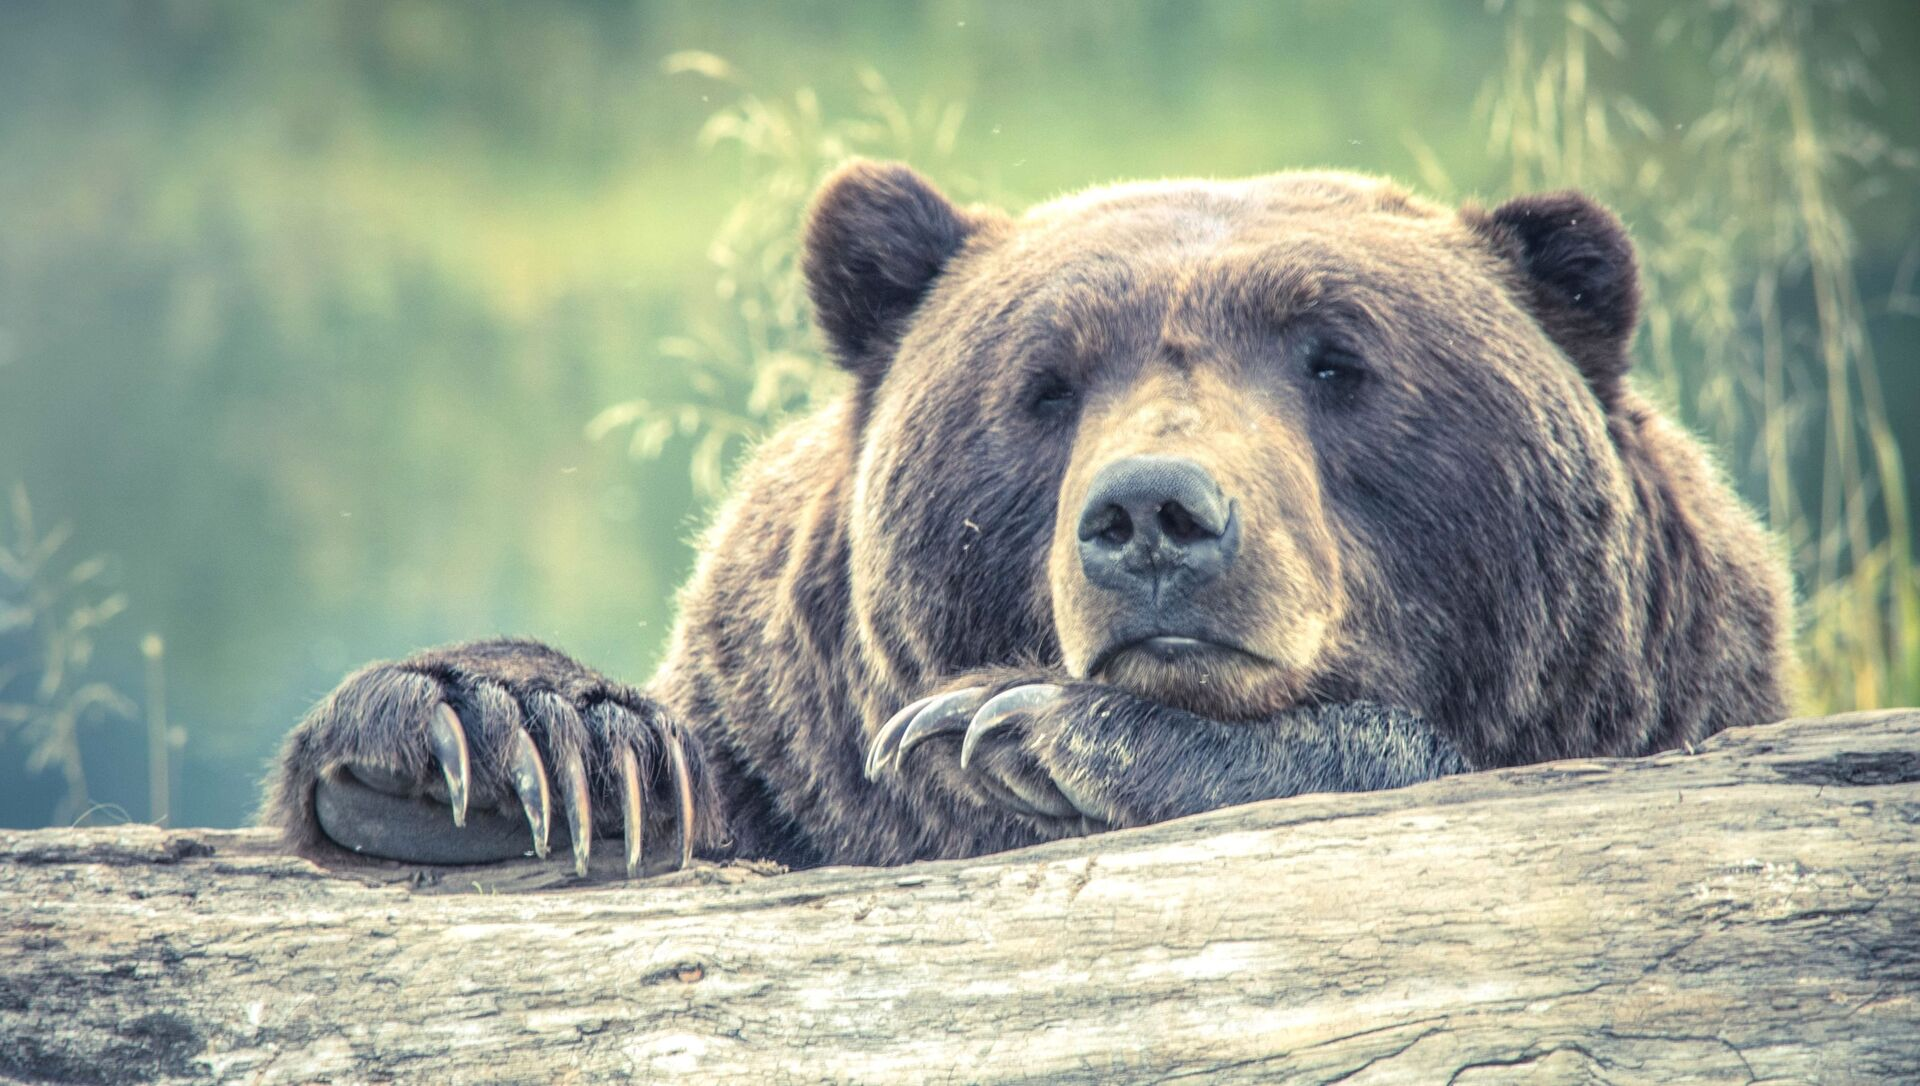 L'orso bruno - Sputnik Italia, 1920, 06.05.2021